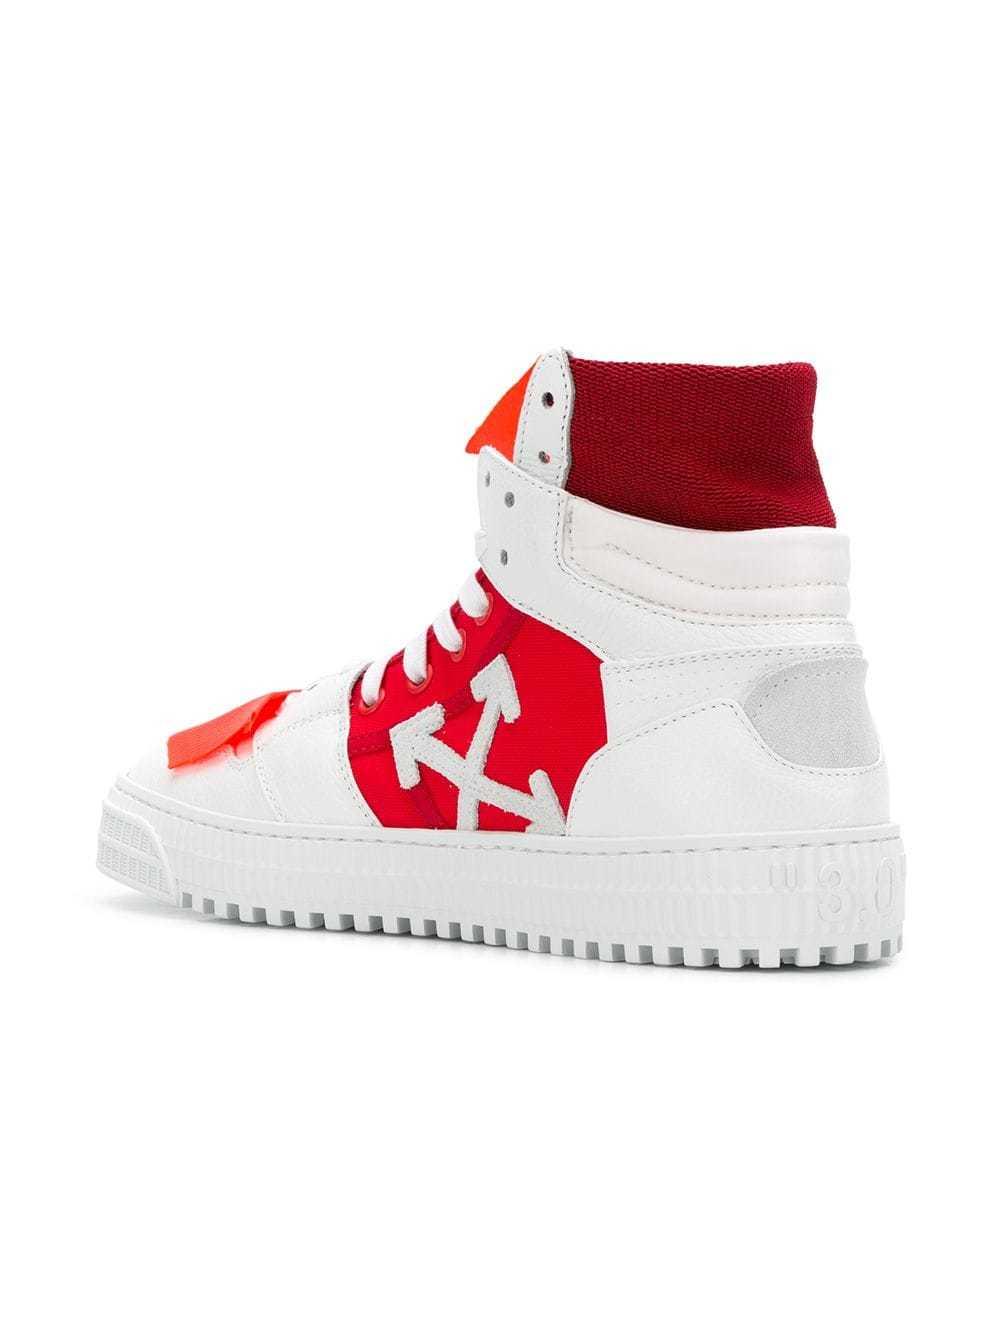 Off-White Colour Block Hi Top Sneakers